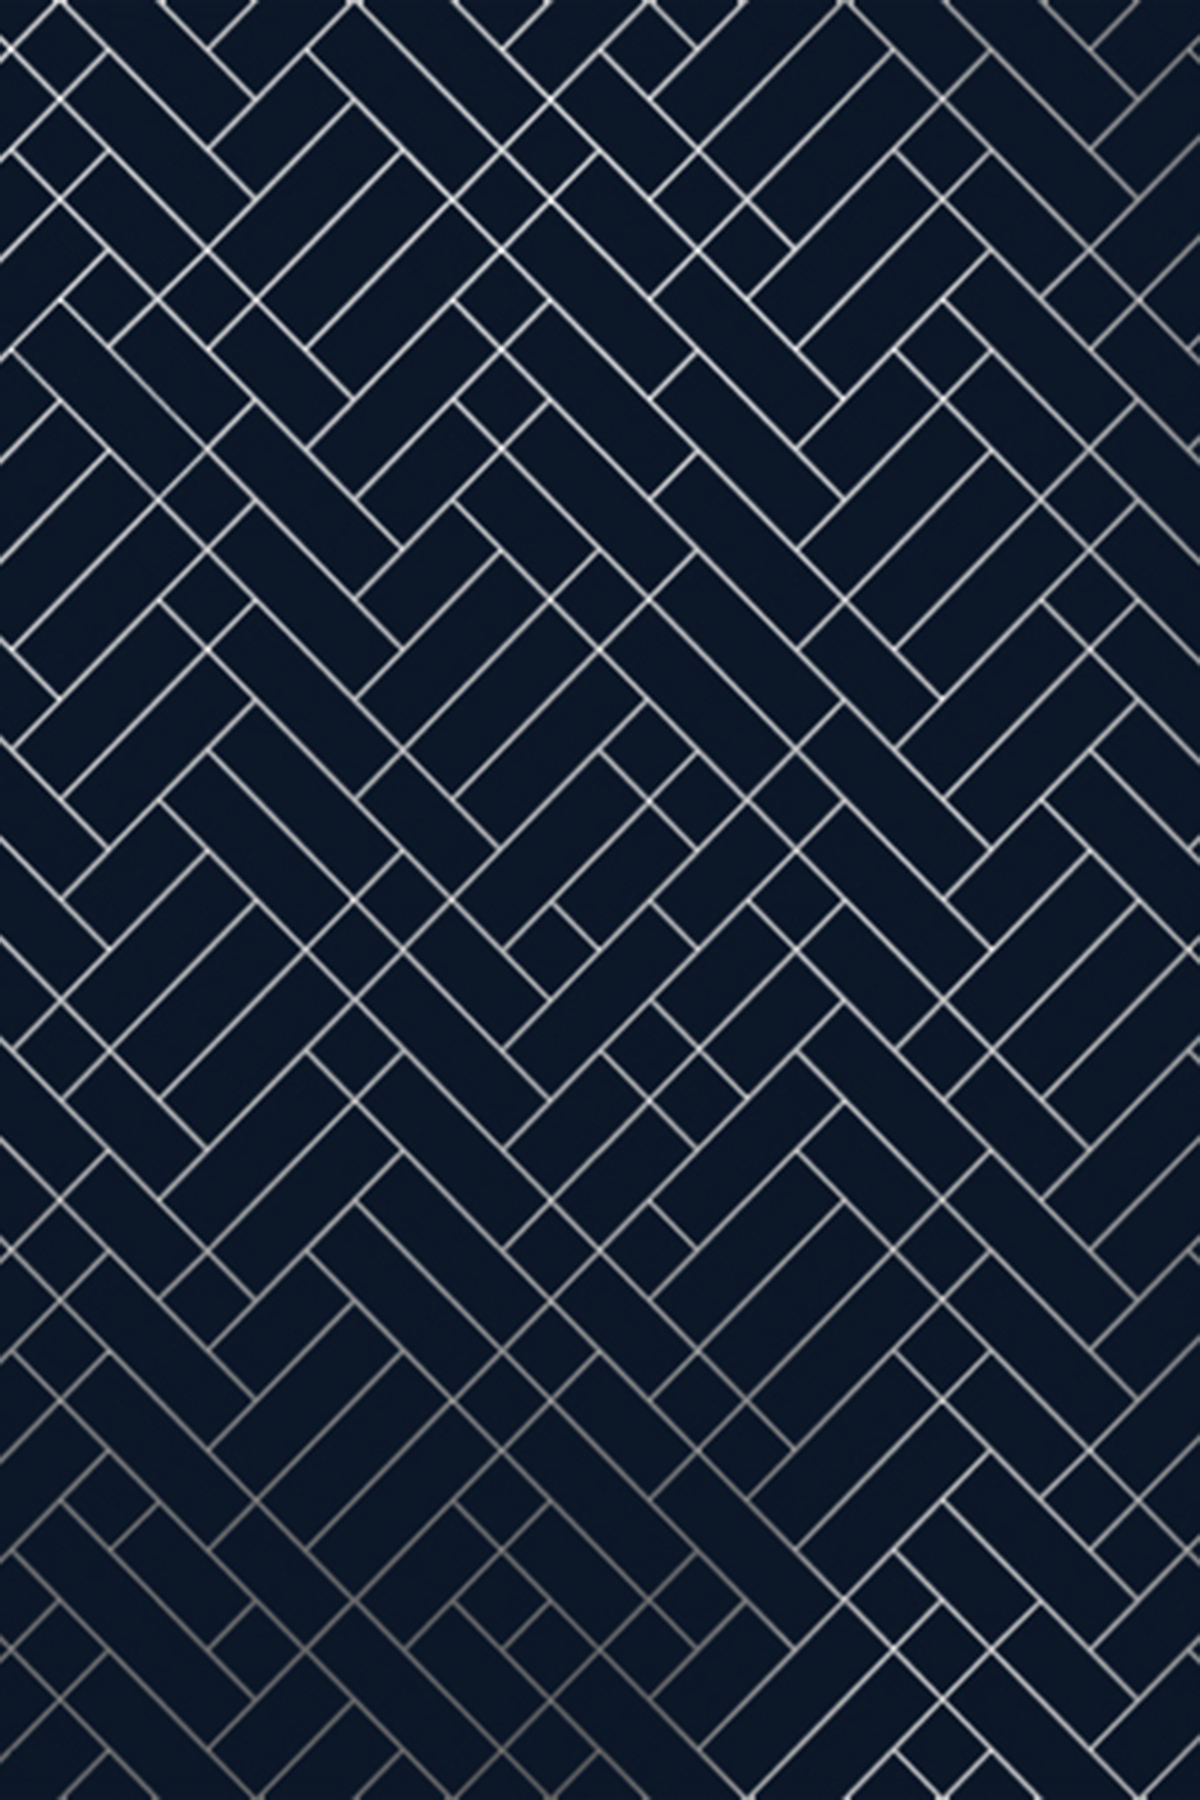 46+ Navy and Silver Wallpaper on WallpaperSafari